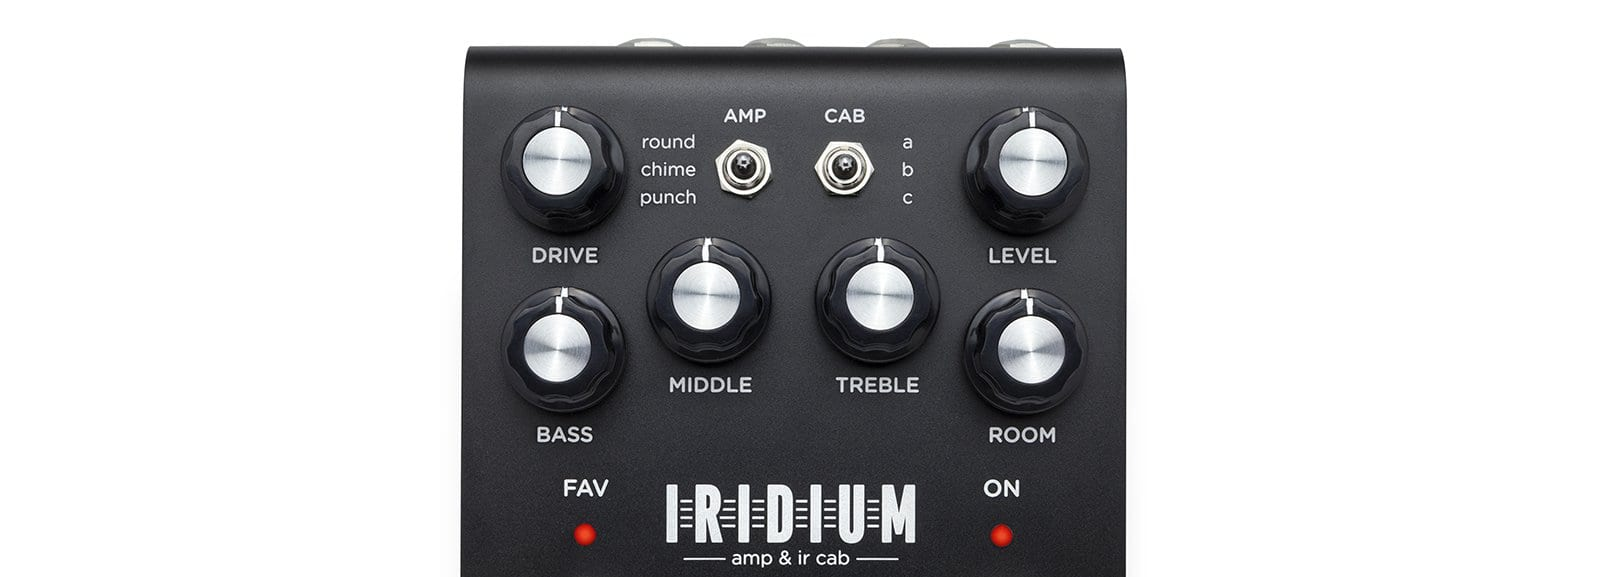 Strymon Iridium Amp & IR Modeler top